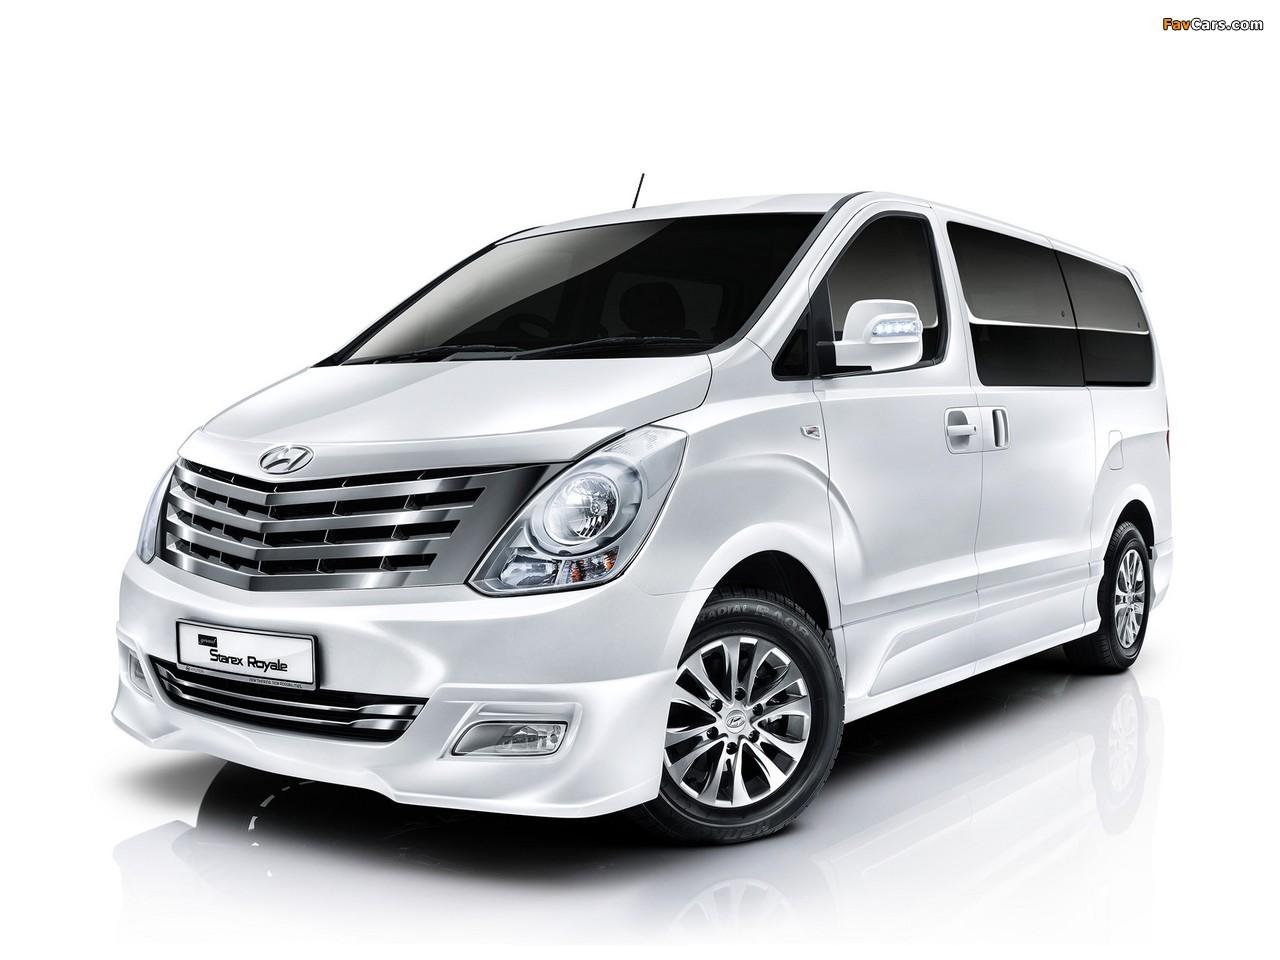 Hyundai Grand Starex Royale 2011 images (1280 x 960)